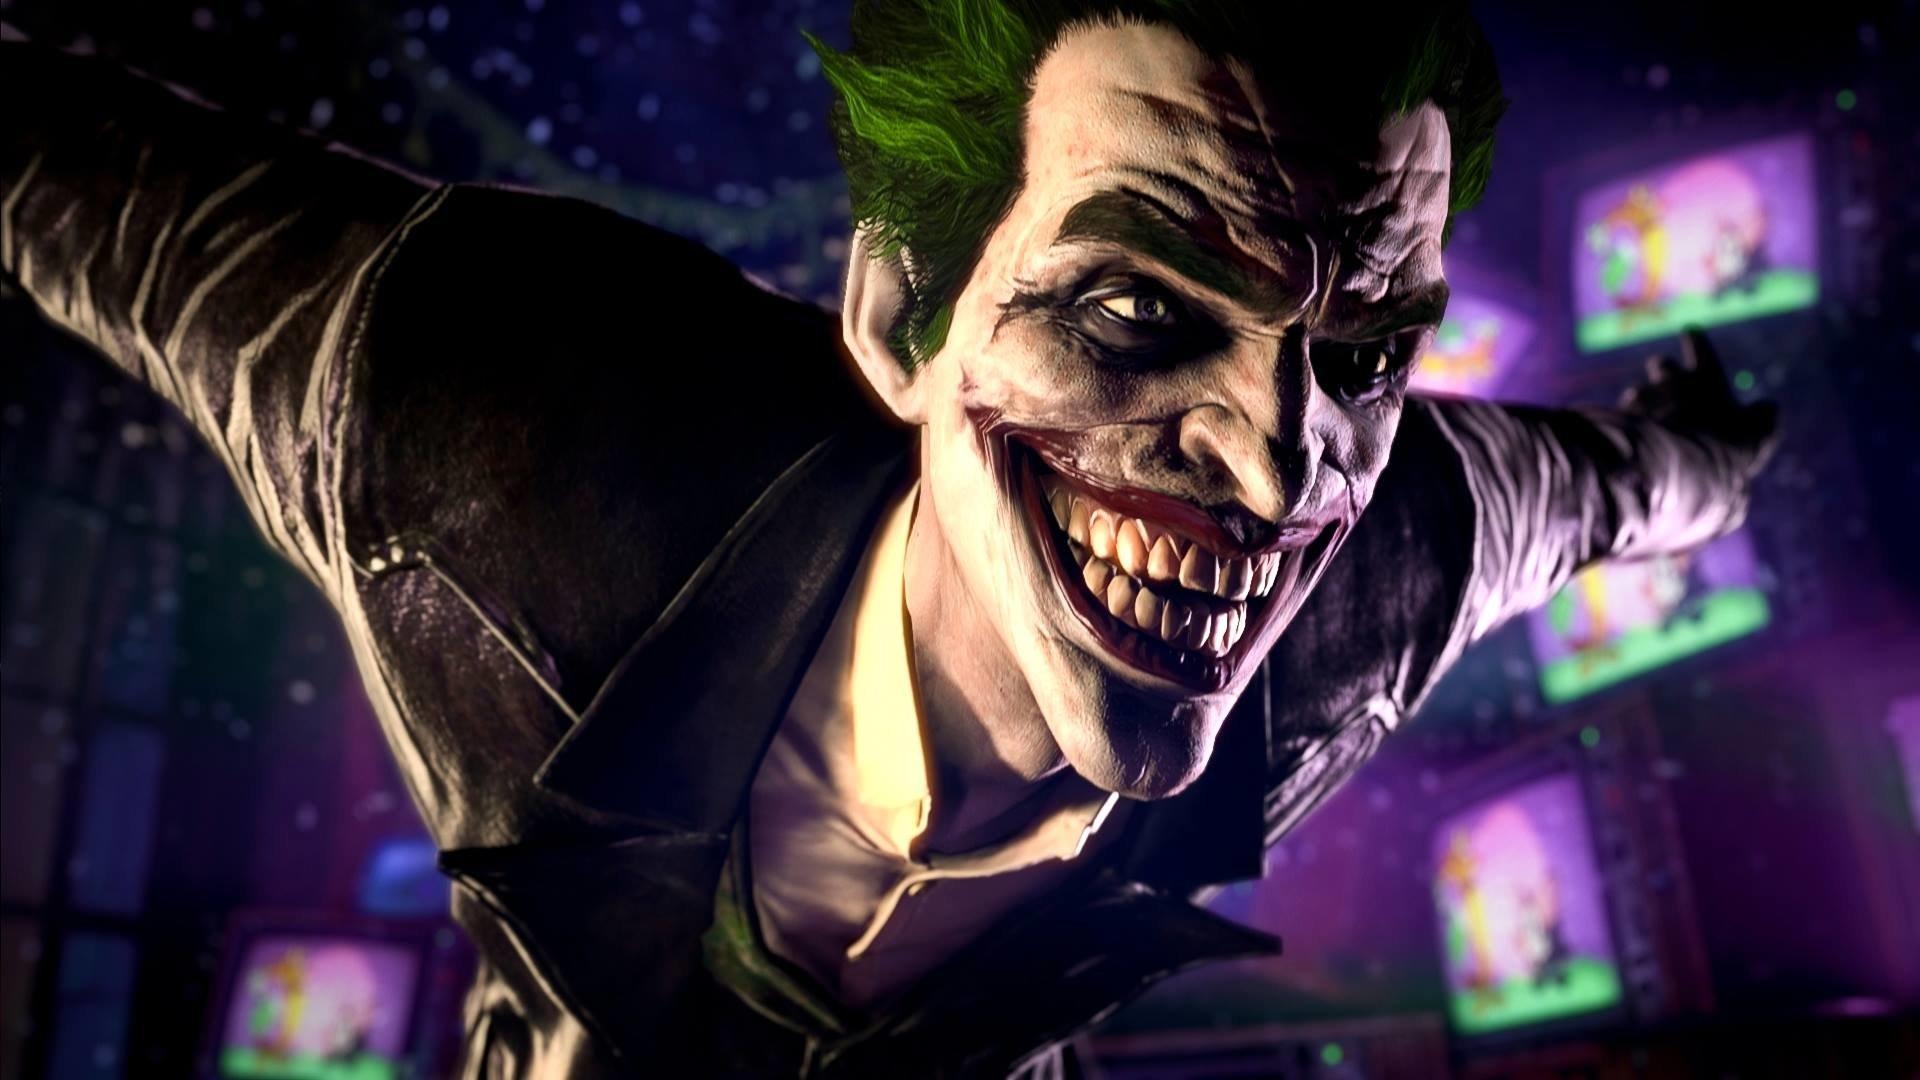 Batman arkham origins full hd wallpaper and background image video game batman arkham origins joker wallpaper voltagebd Images